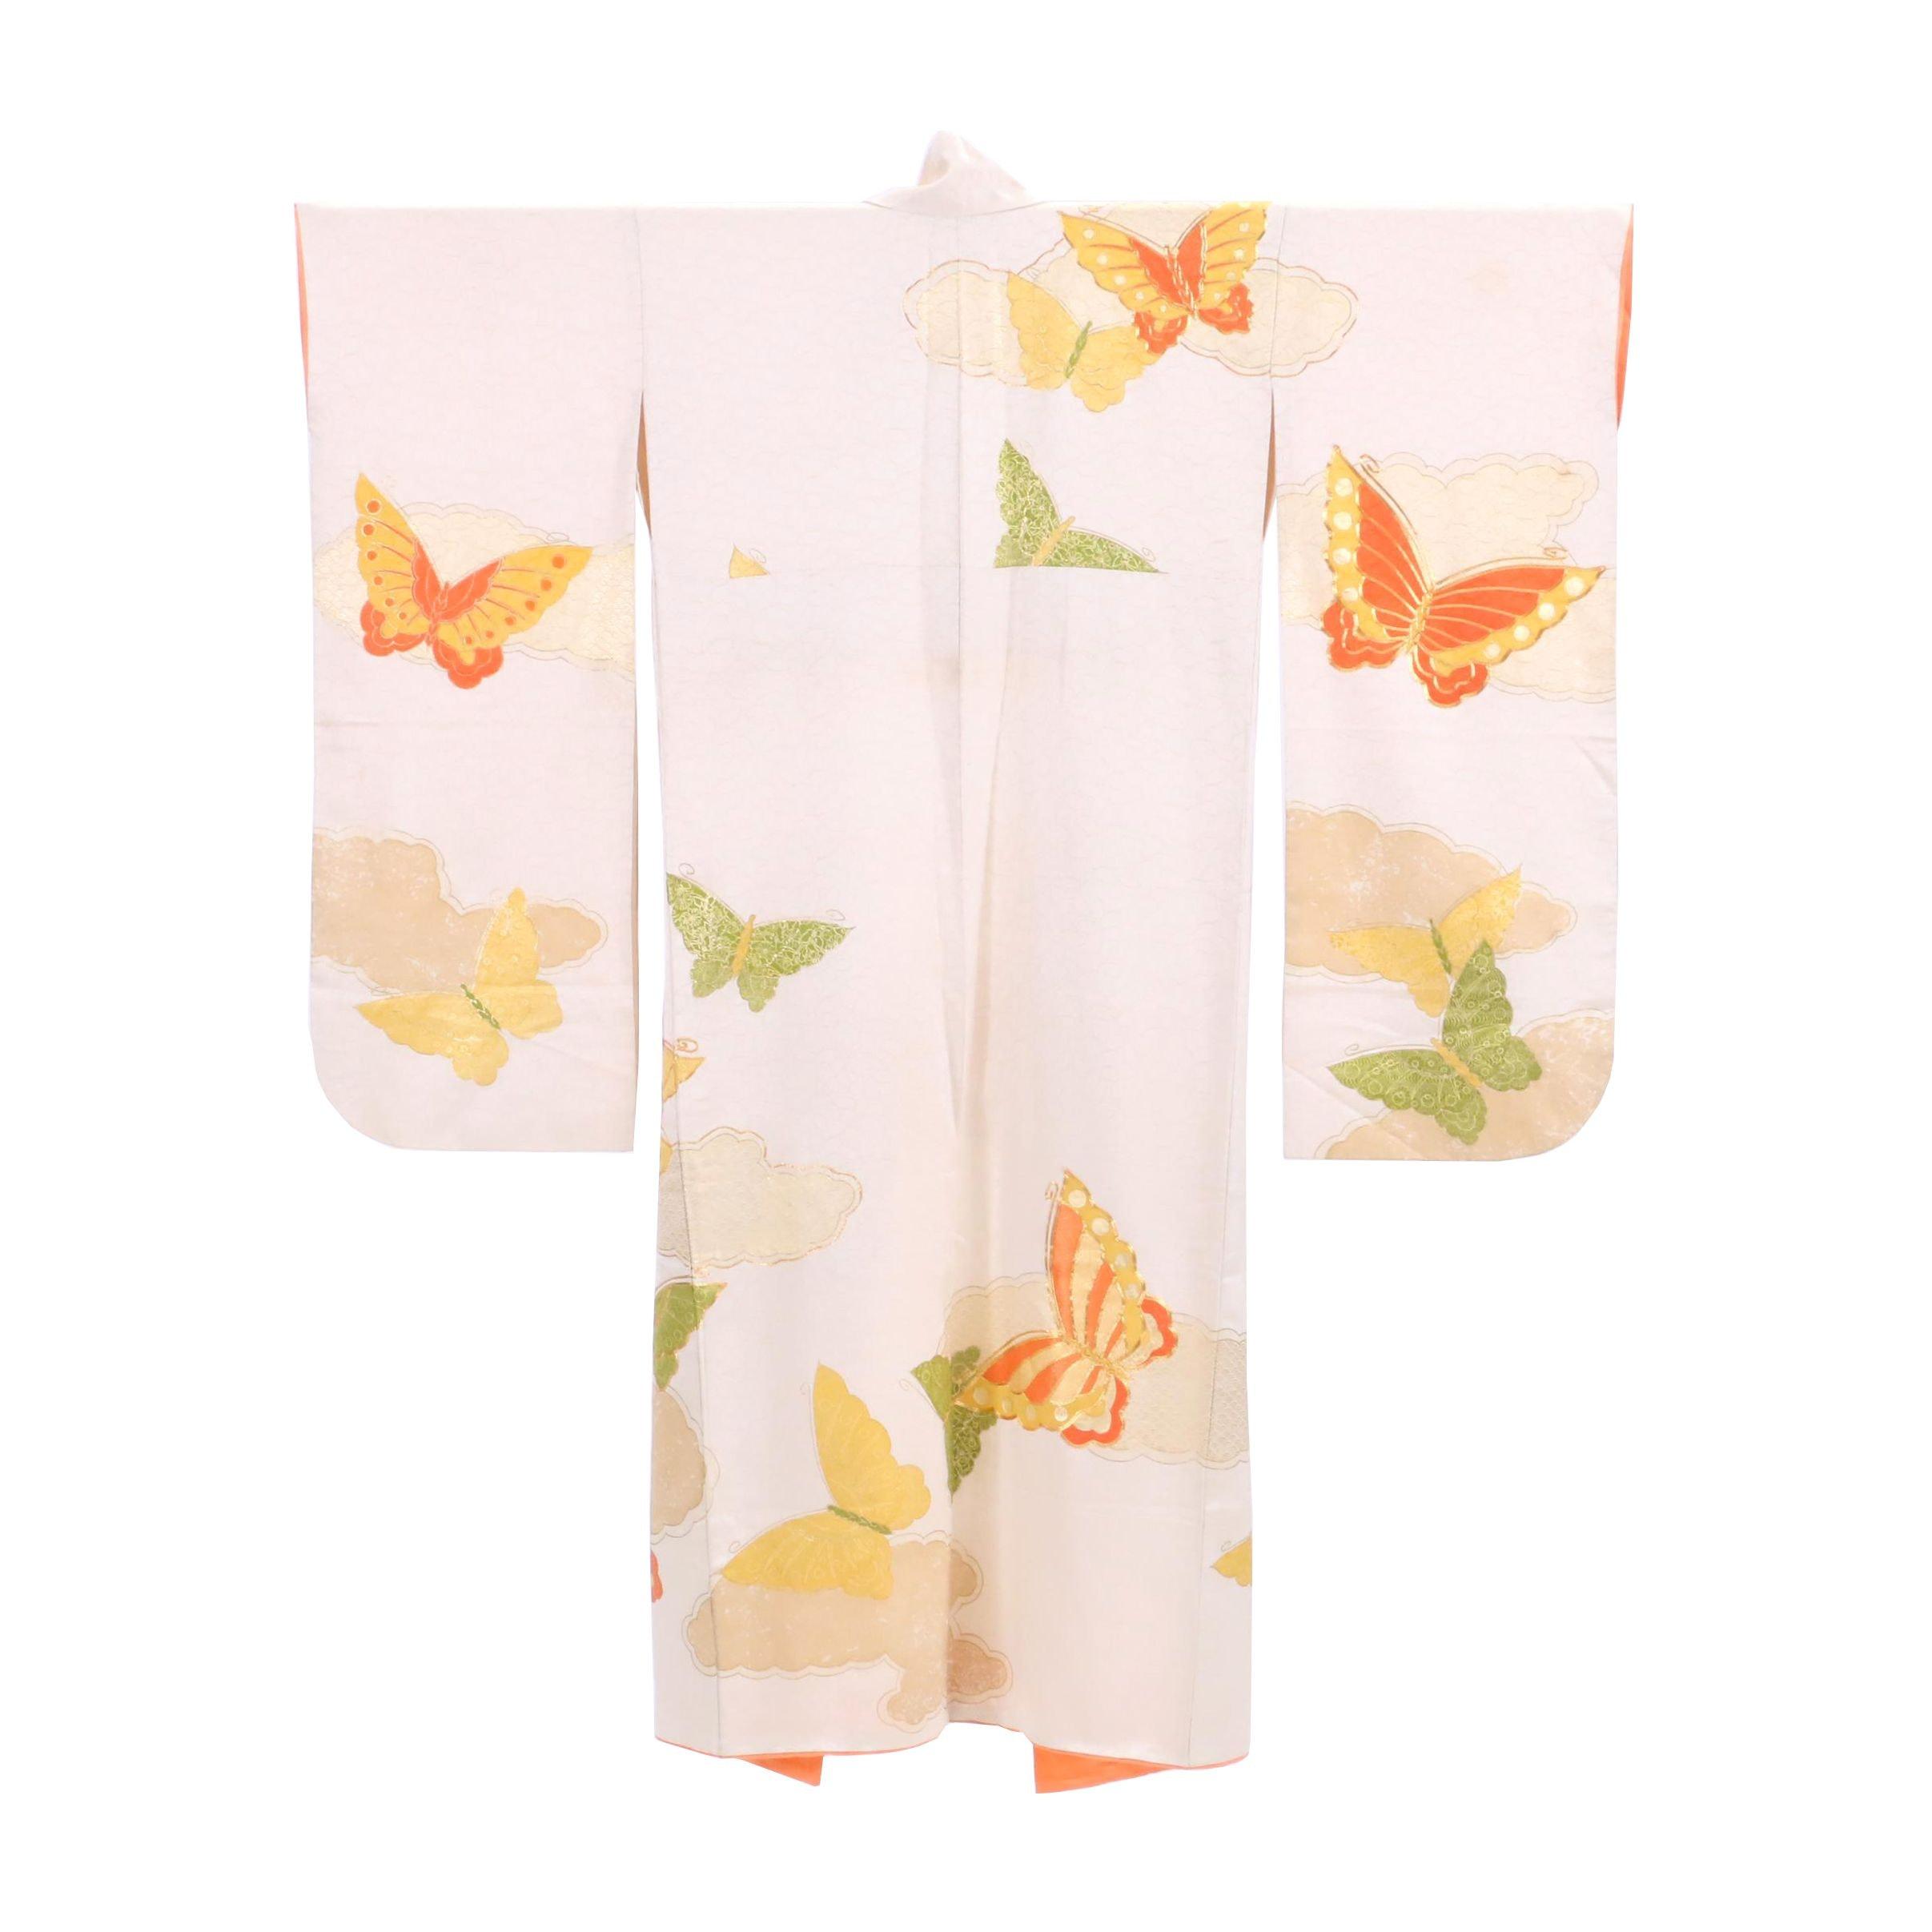 Vintage Japanese Handwoven Silk Furisode Kimono